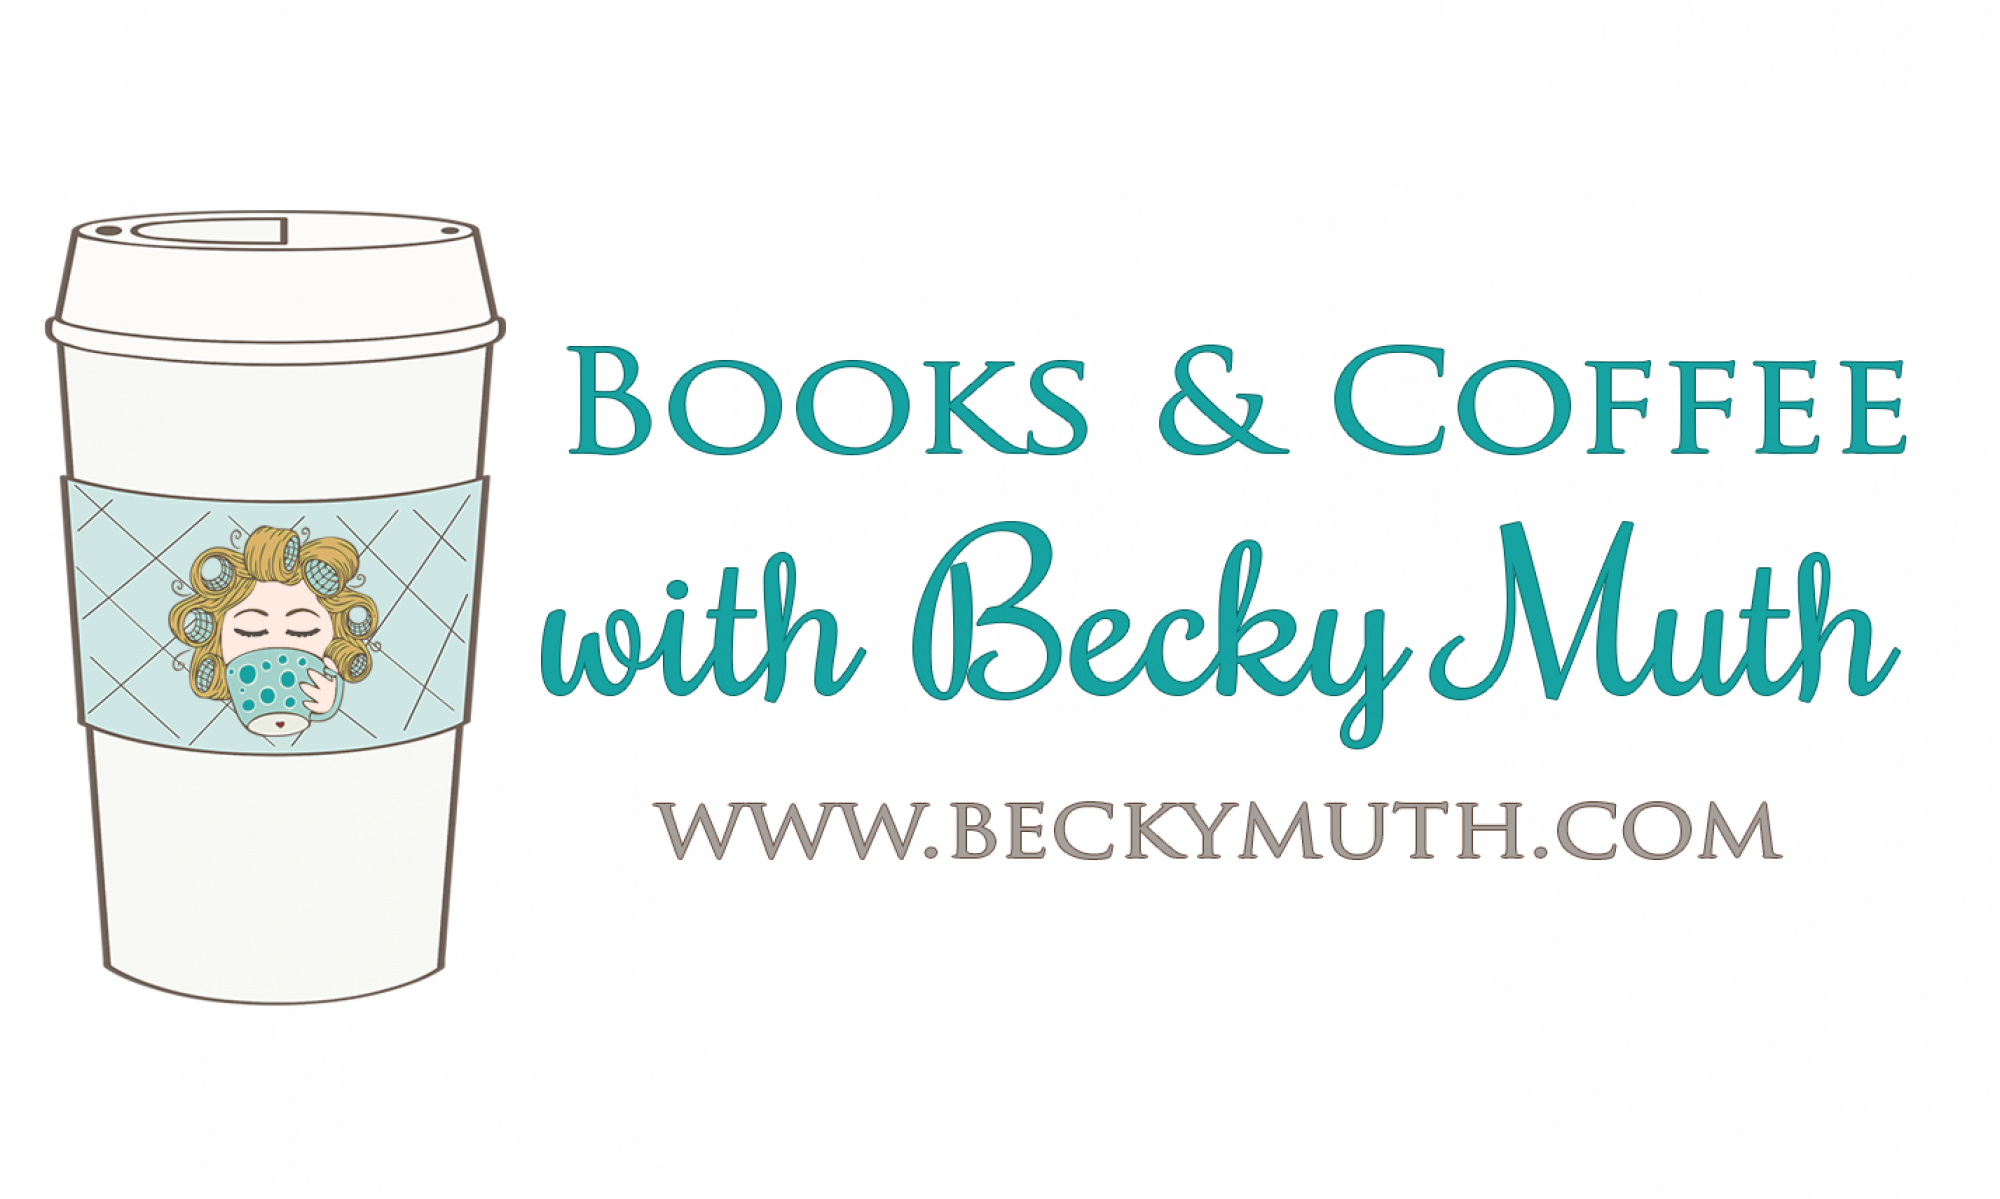 Becky Muth